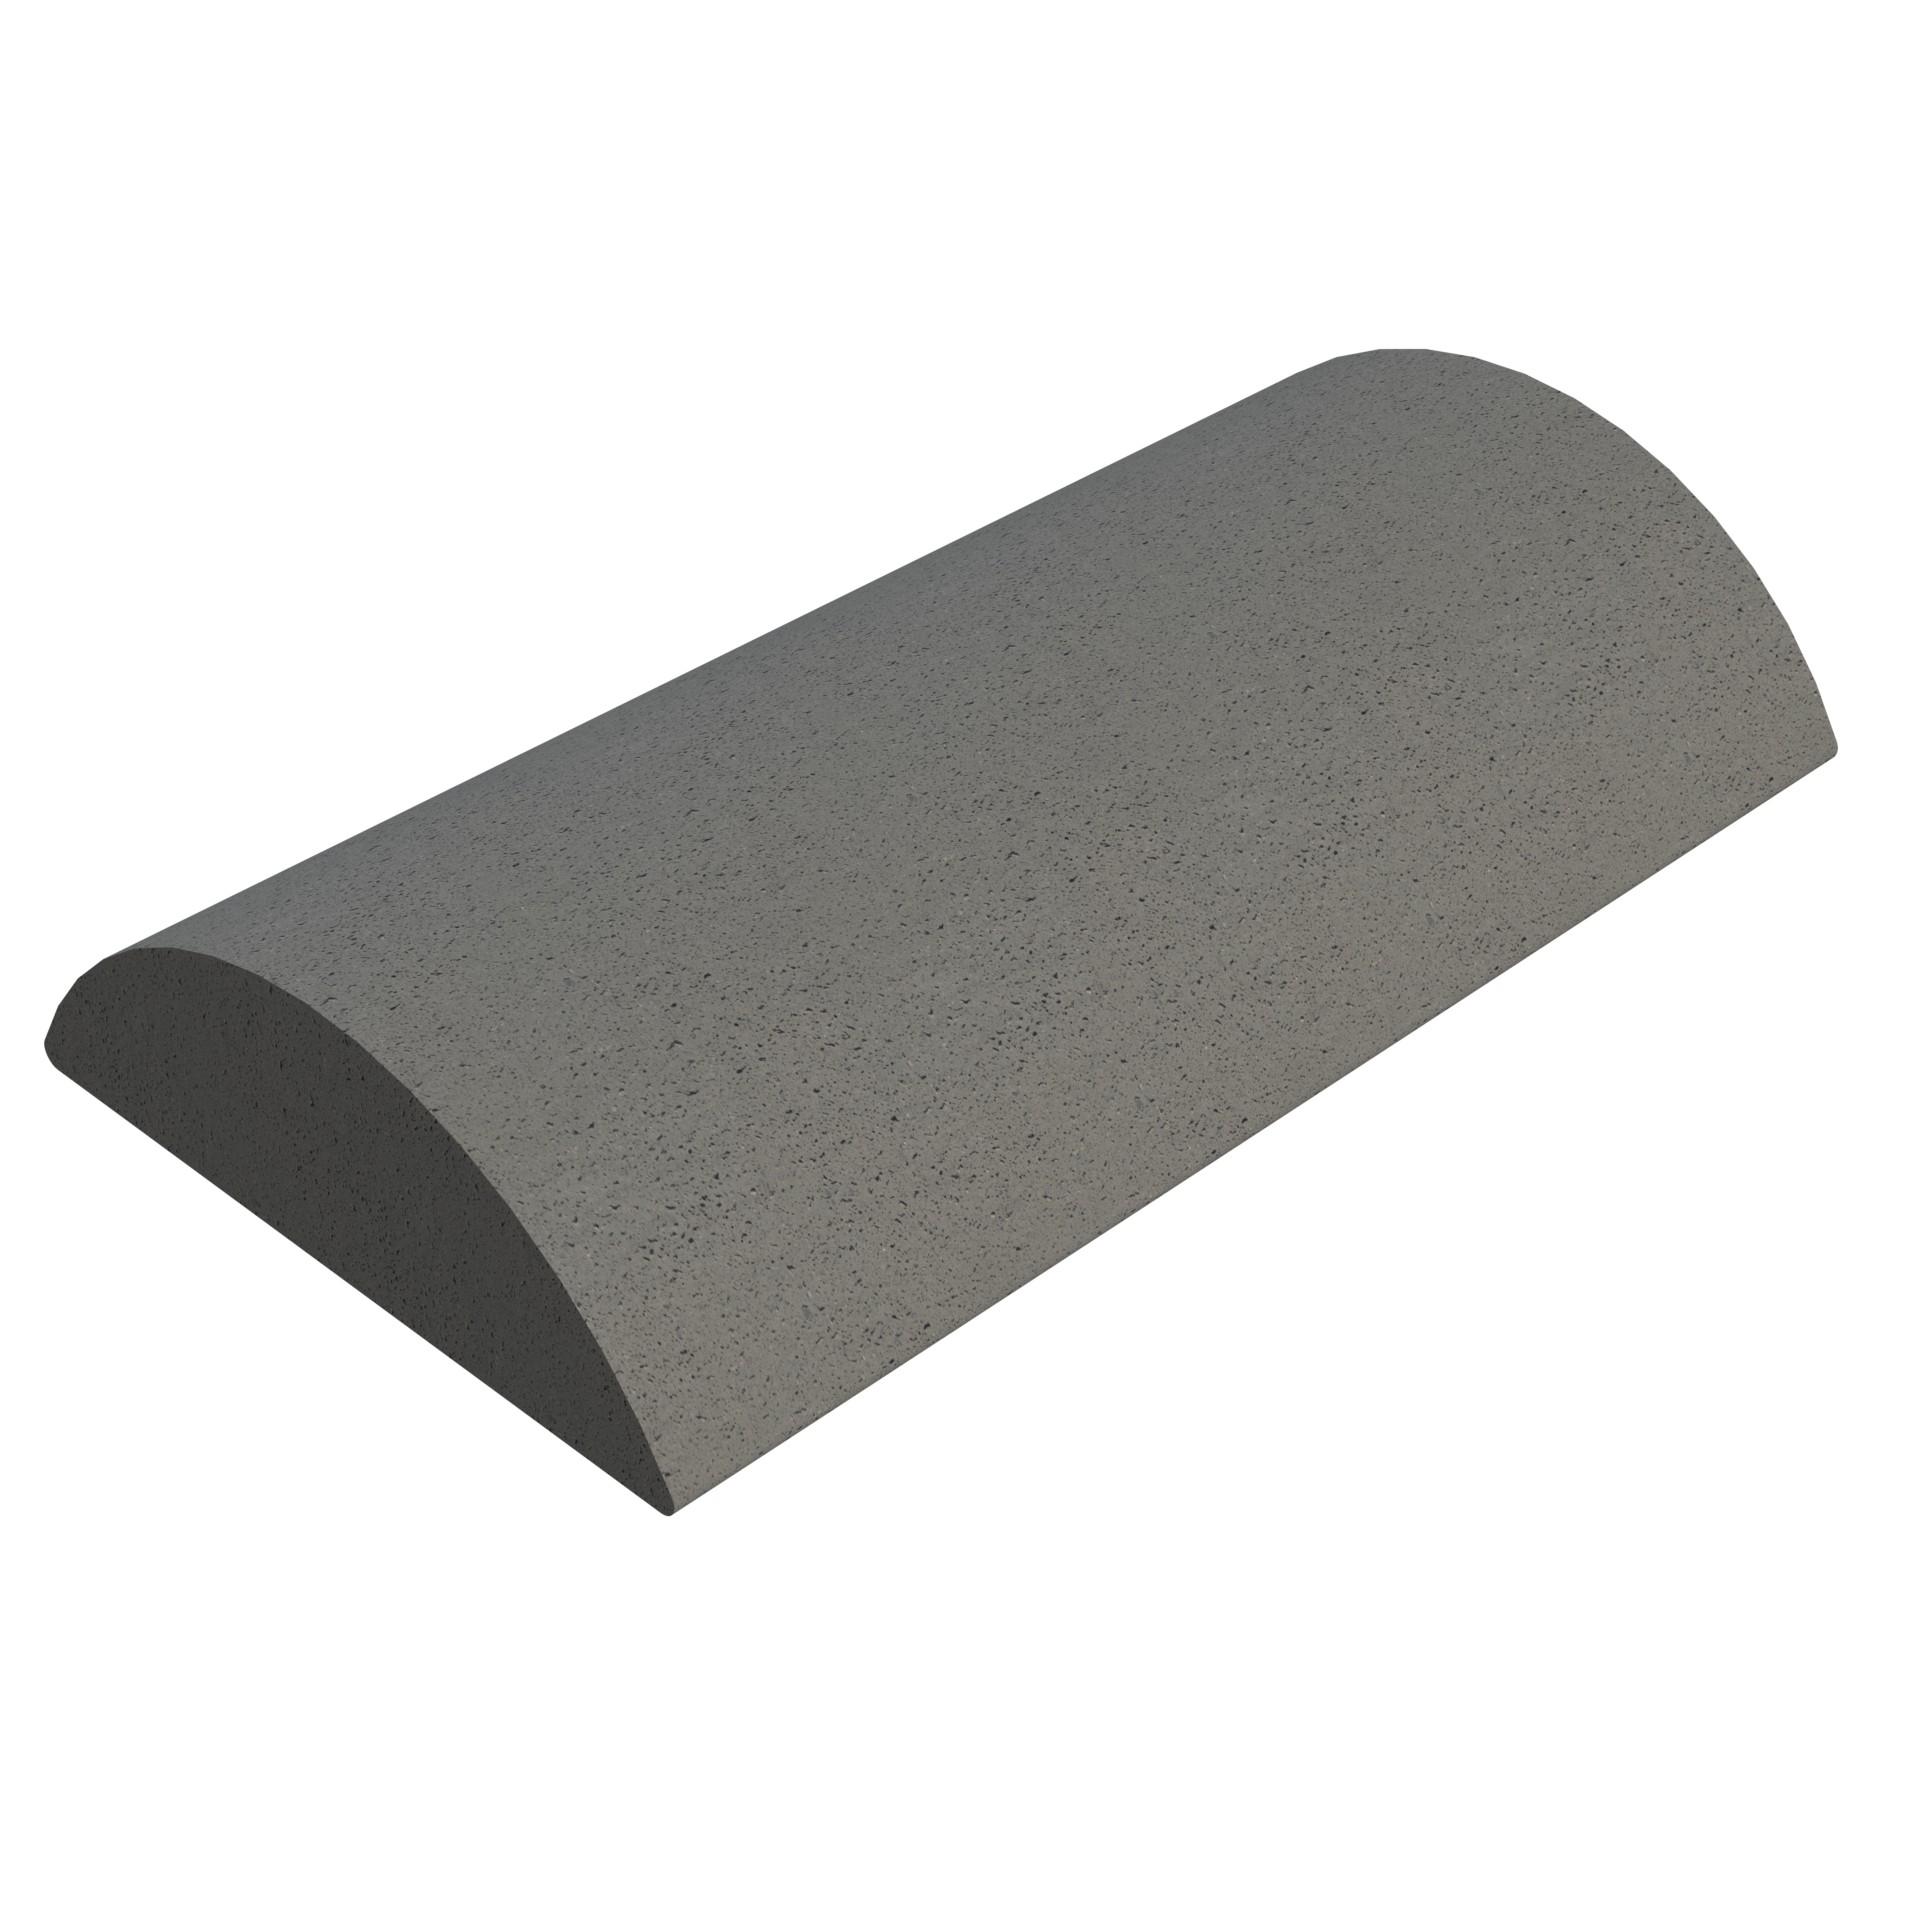 SANDTOFT TILES - Concrete Segmental Ridge With Gable Stop End